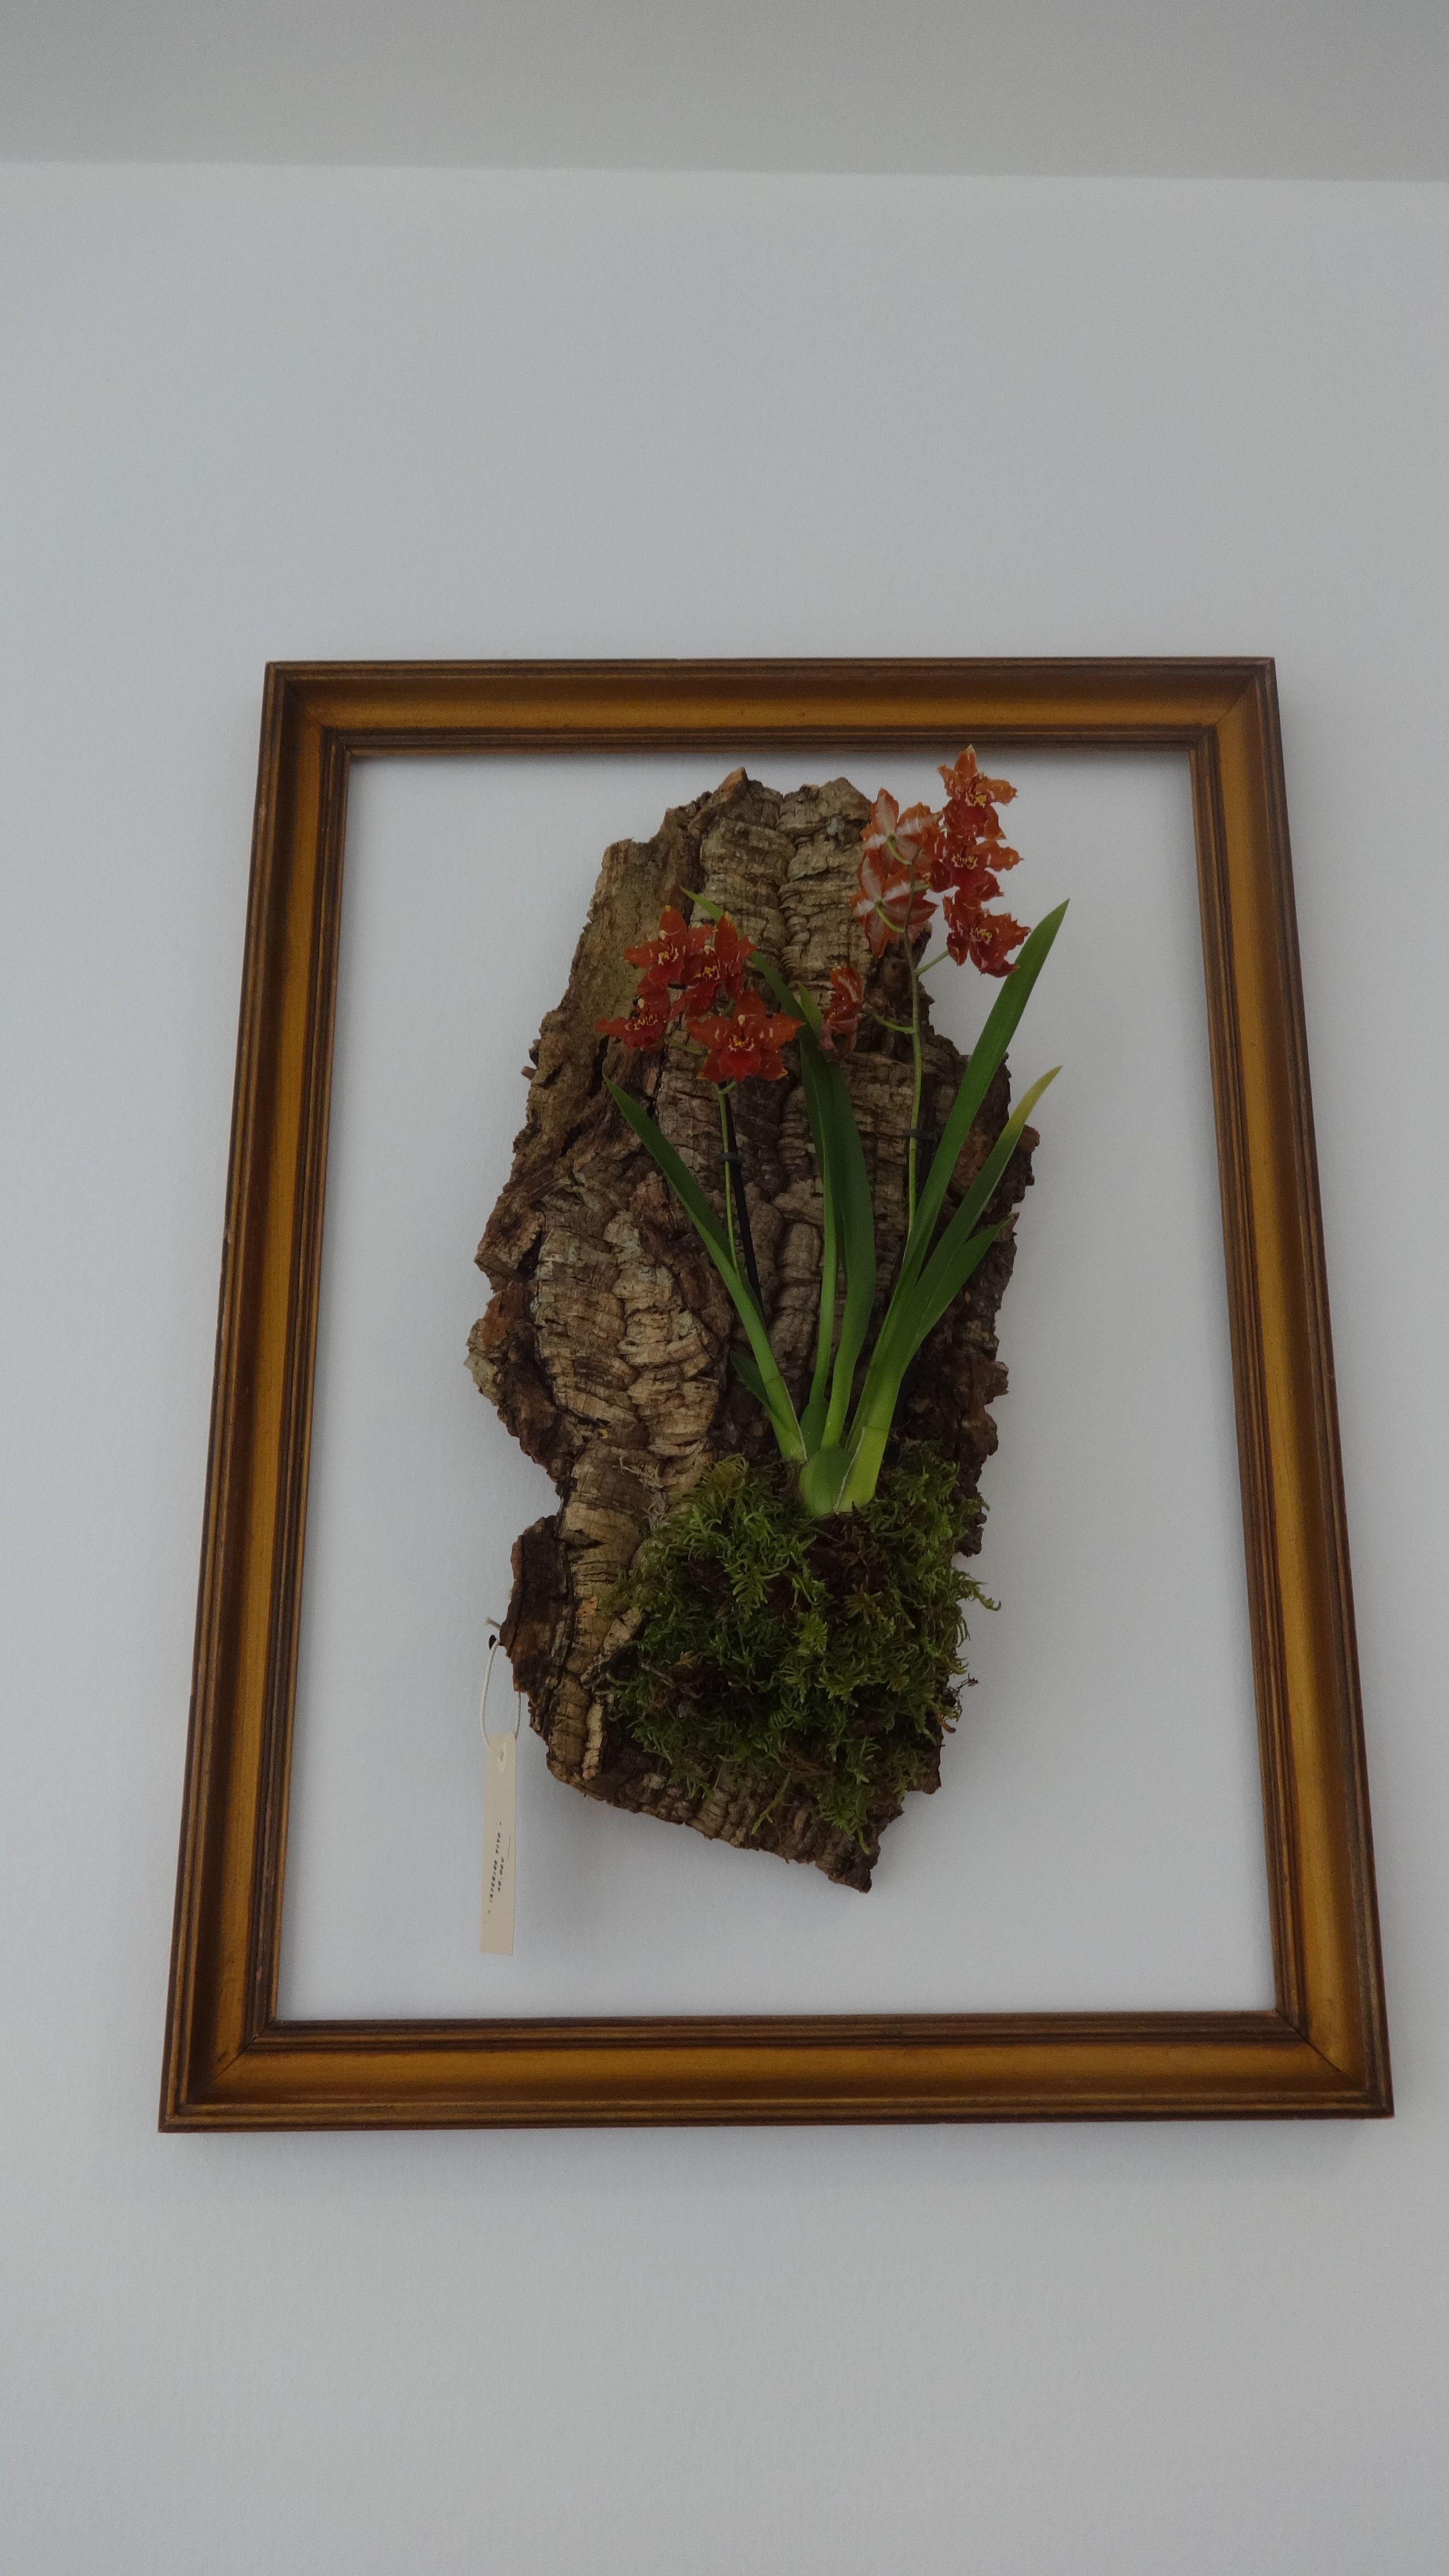 Quadro com jardim vertical em cortiça, Cork, vertical garden, orchis, orquídea, plantas